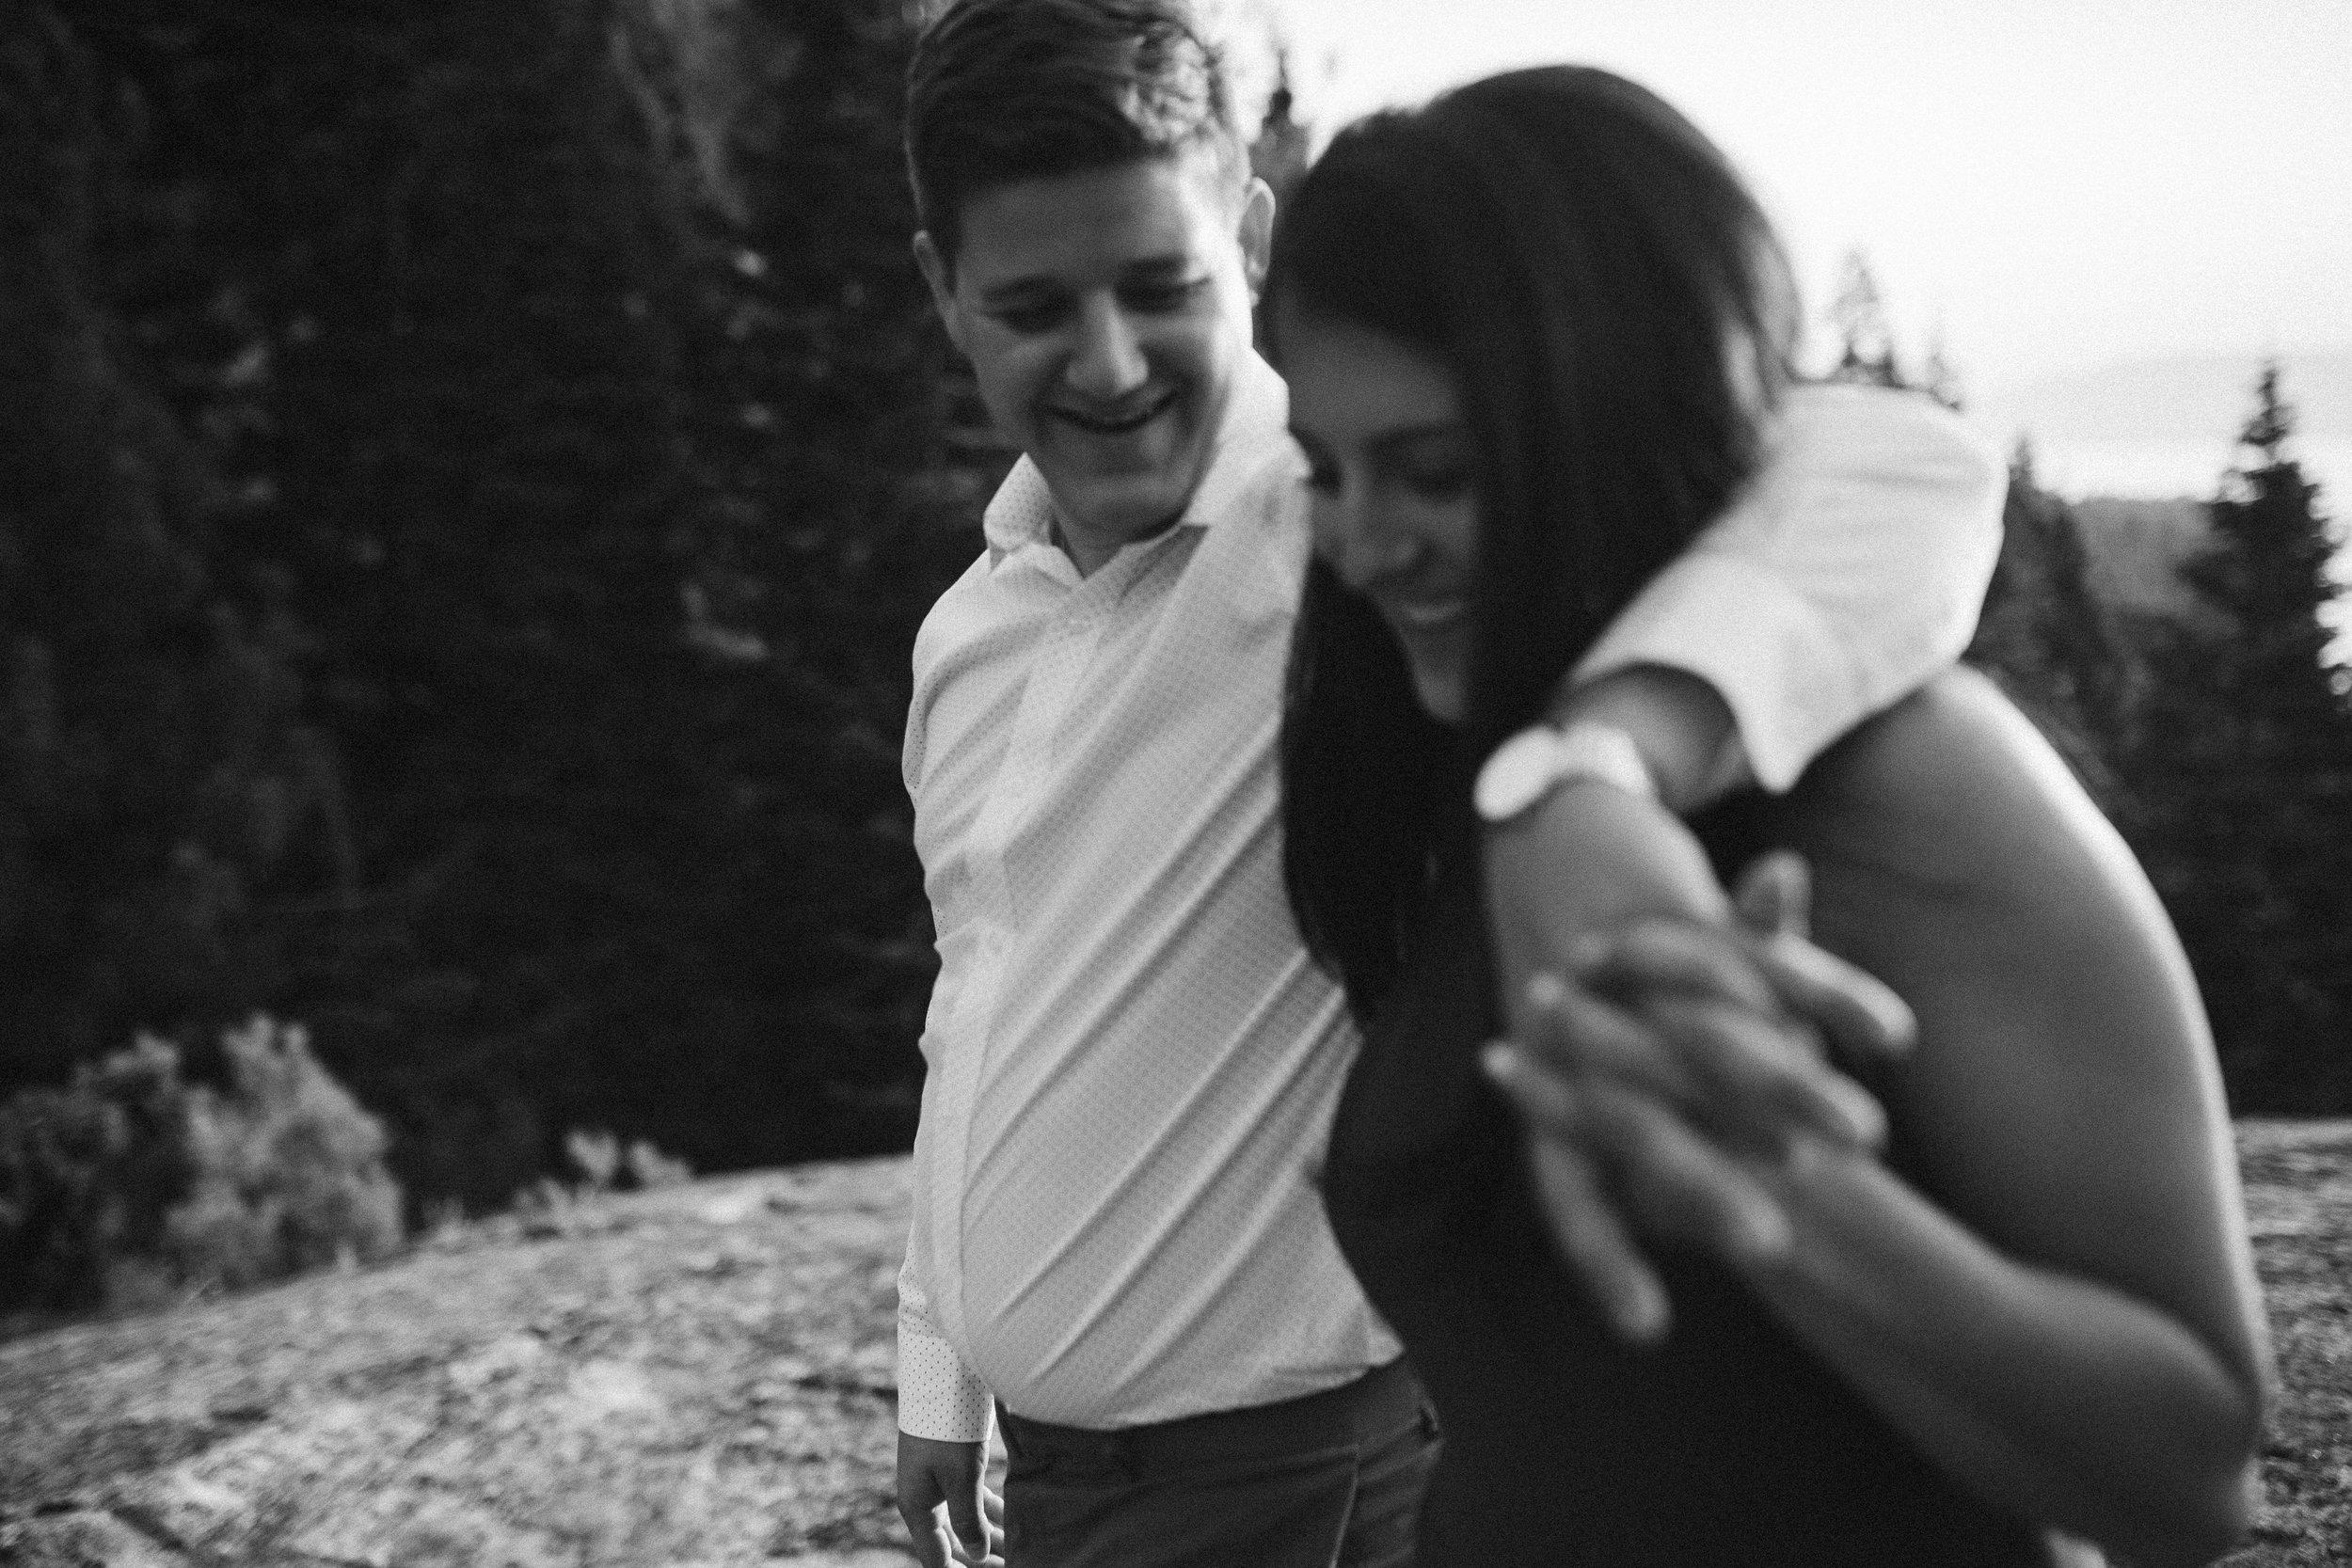 nicole-daacke-photography-lake-tahoe-sunrise-summer-adventure-engagement-photos-nevada-wedding-elopement-photographer-golden-emerald-bay-light-pine-trees-summer-vibe-fun-carefree-authentic-love-35.jpg